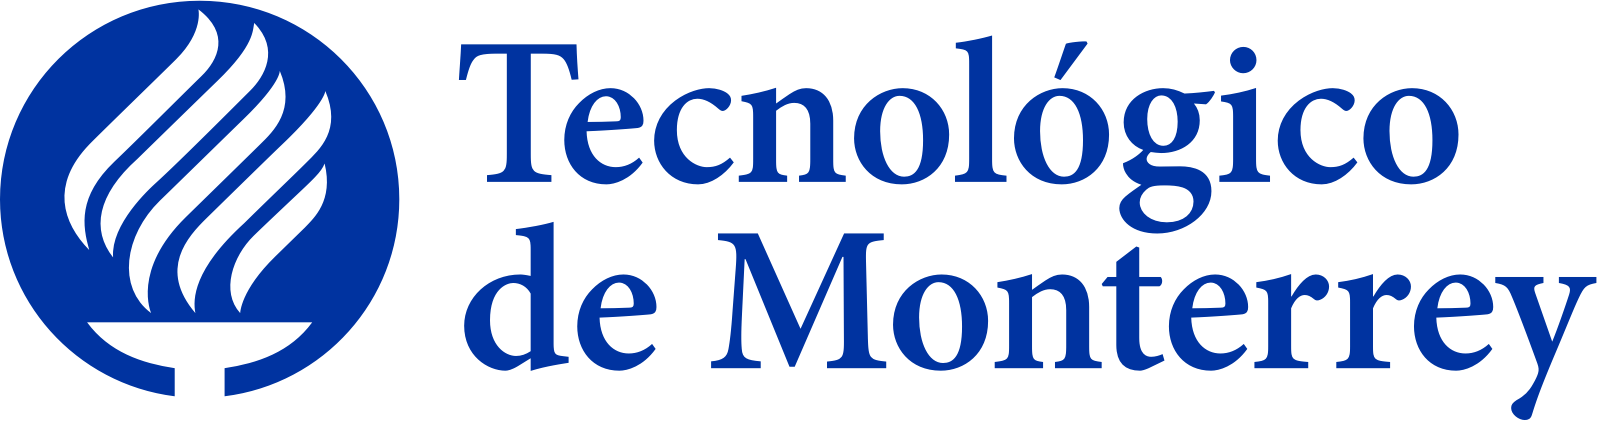 https://0201.nccdn.net/1_2/000/000/0ed/9f9/tecnologico-de-monterrey-blue-1600x421.png